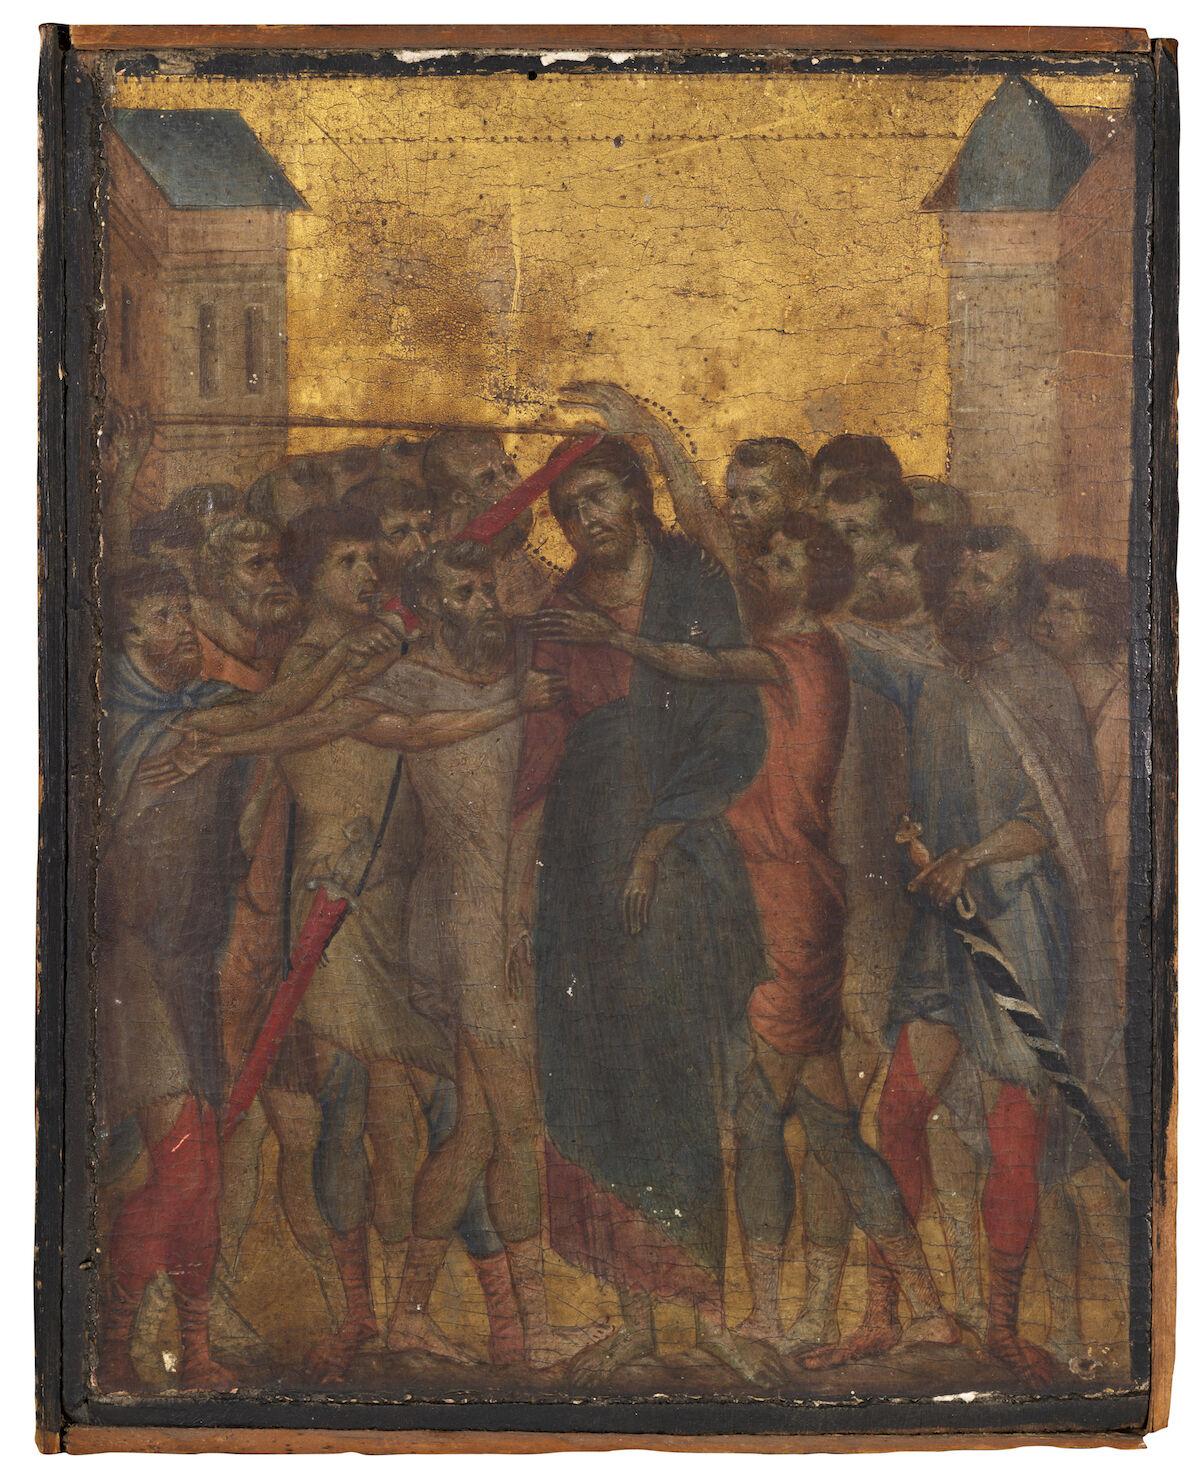 Cimabue, The Mocking of Christ or Christ Mocked.  Sold for €24.1 million ($26.8 million). Image © Actéon.